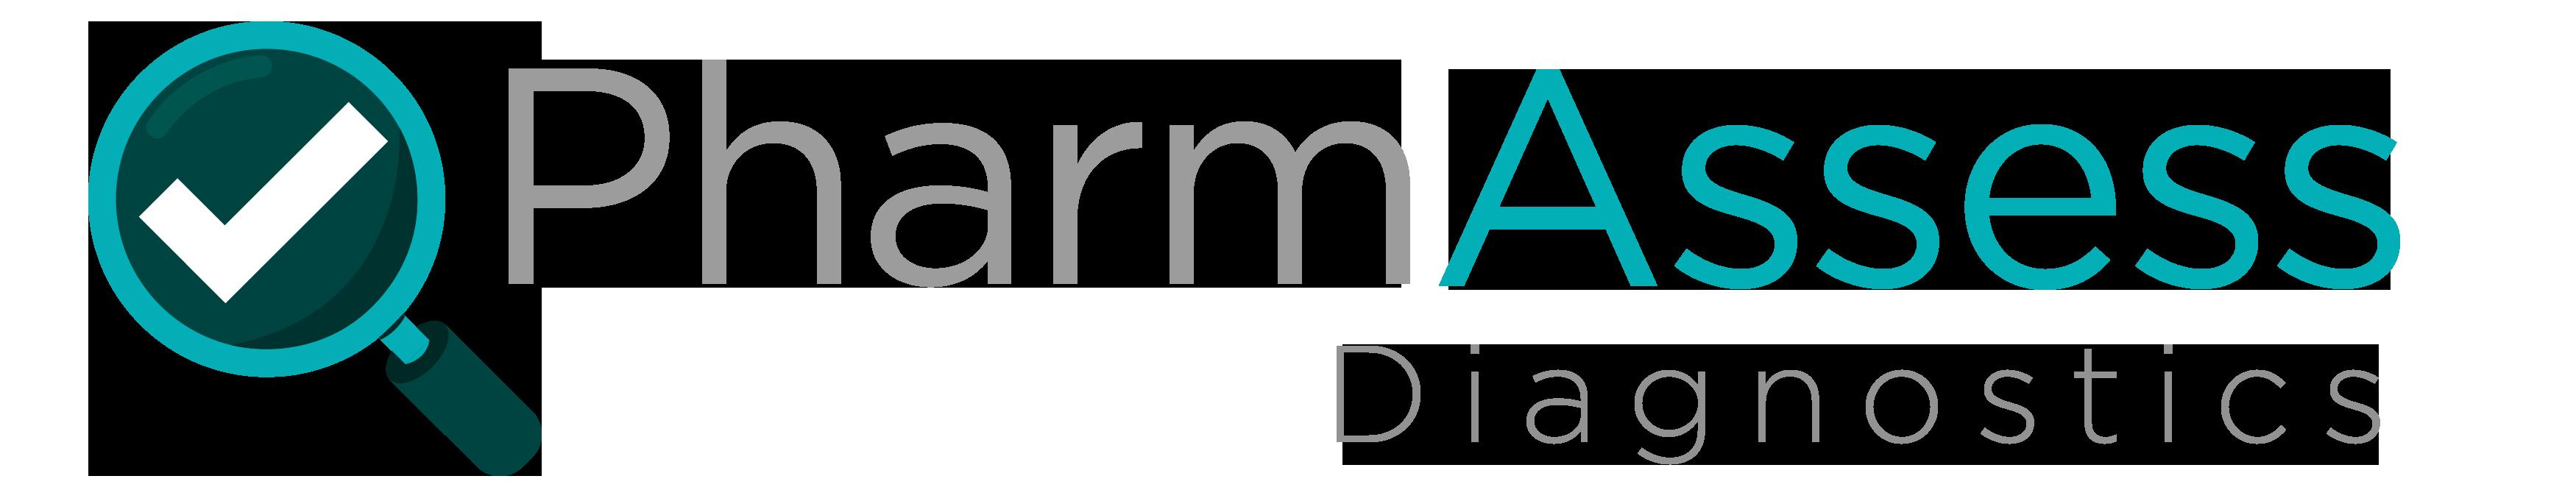 PharmAssess Diagnostics